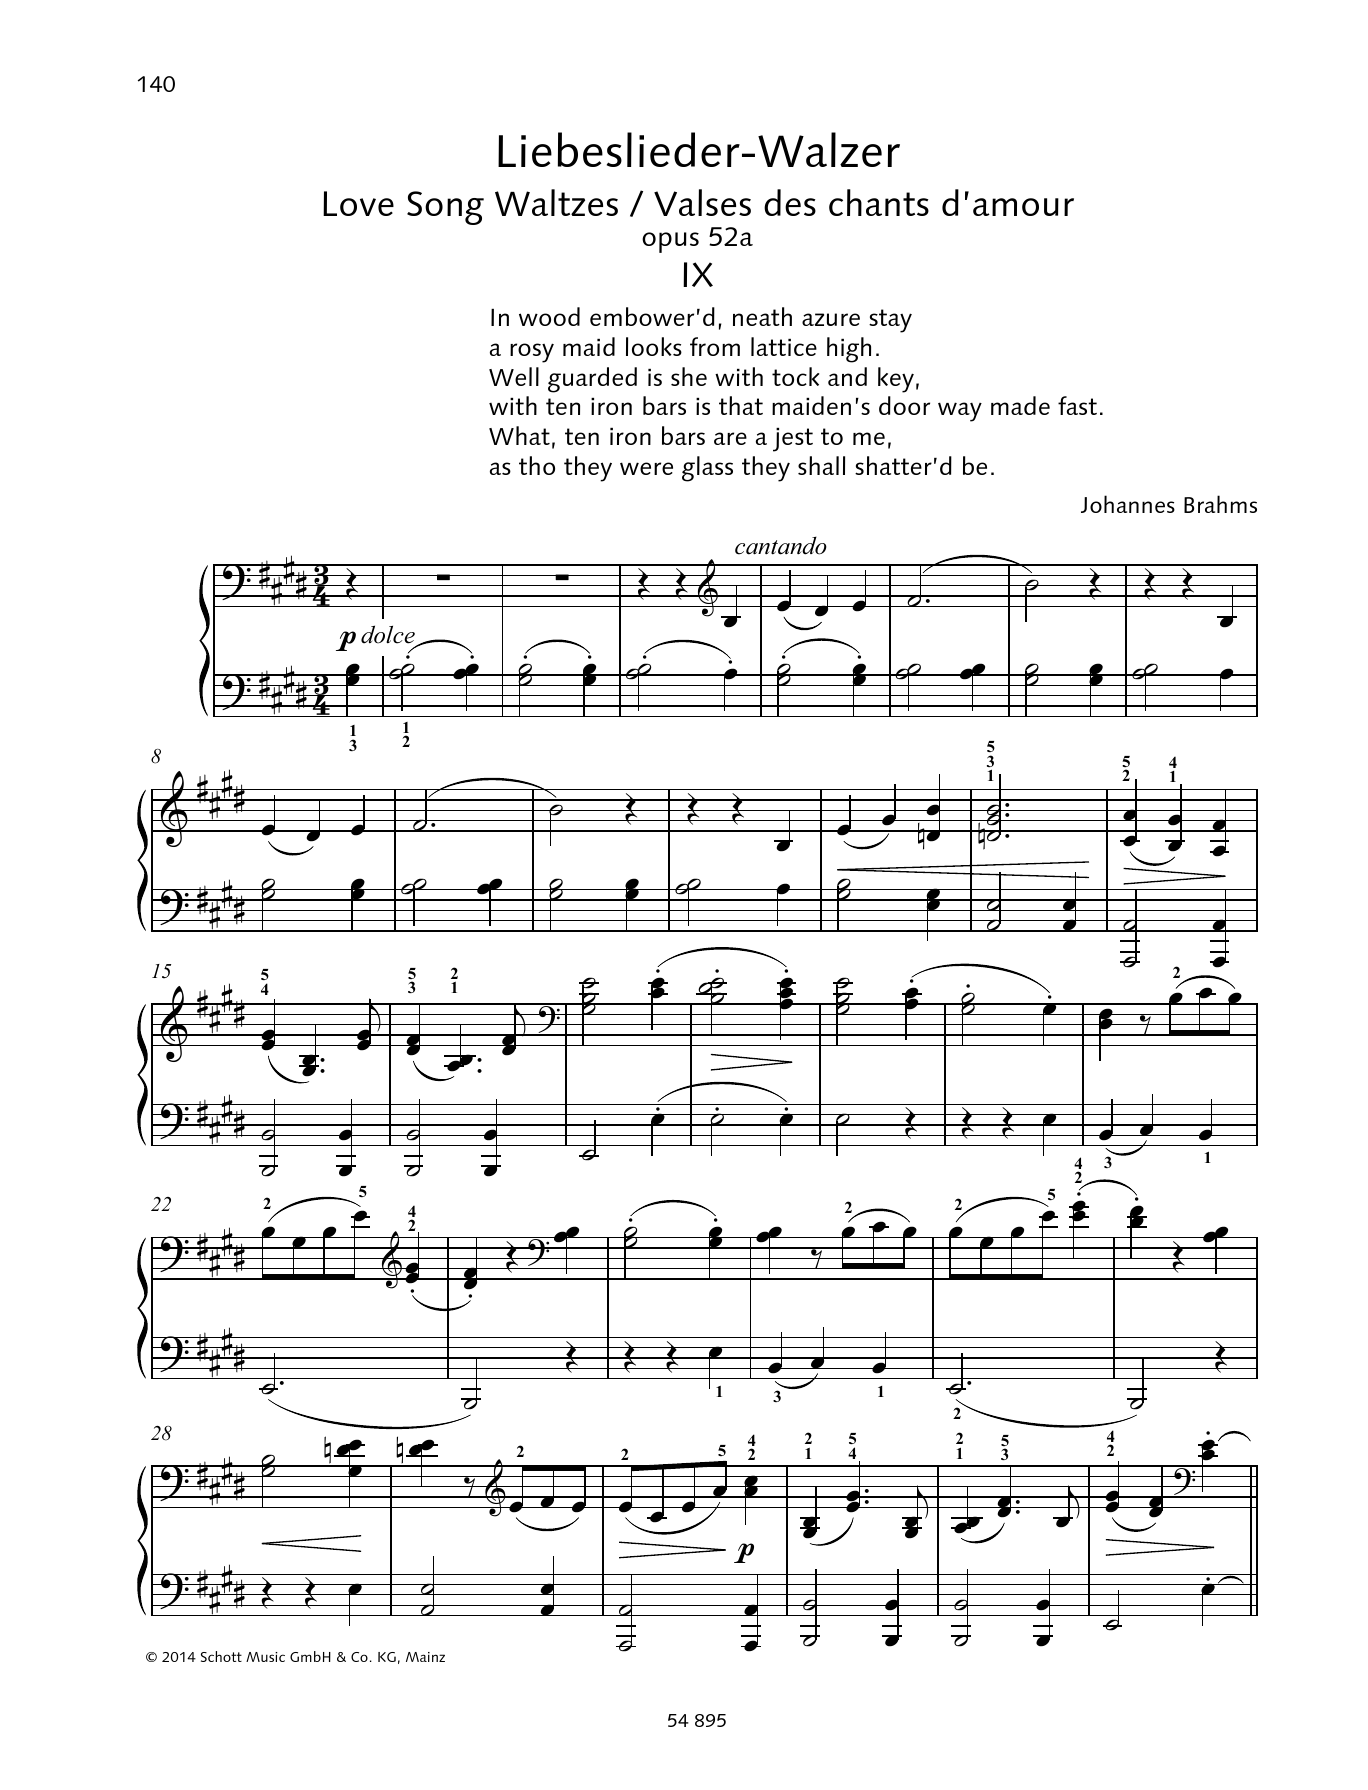 Love Song Waltzes